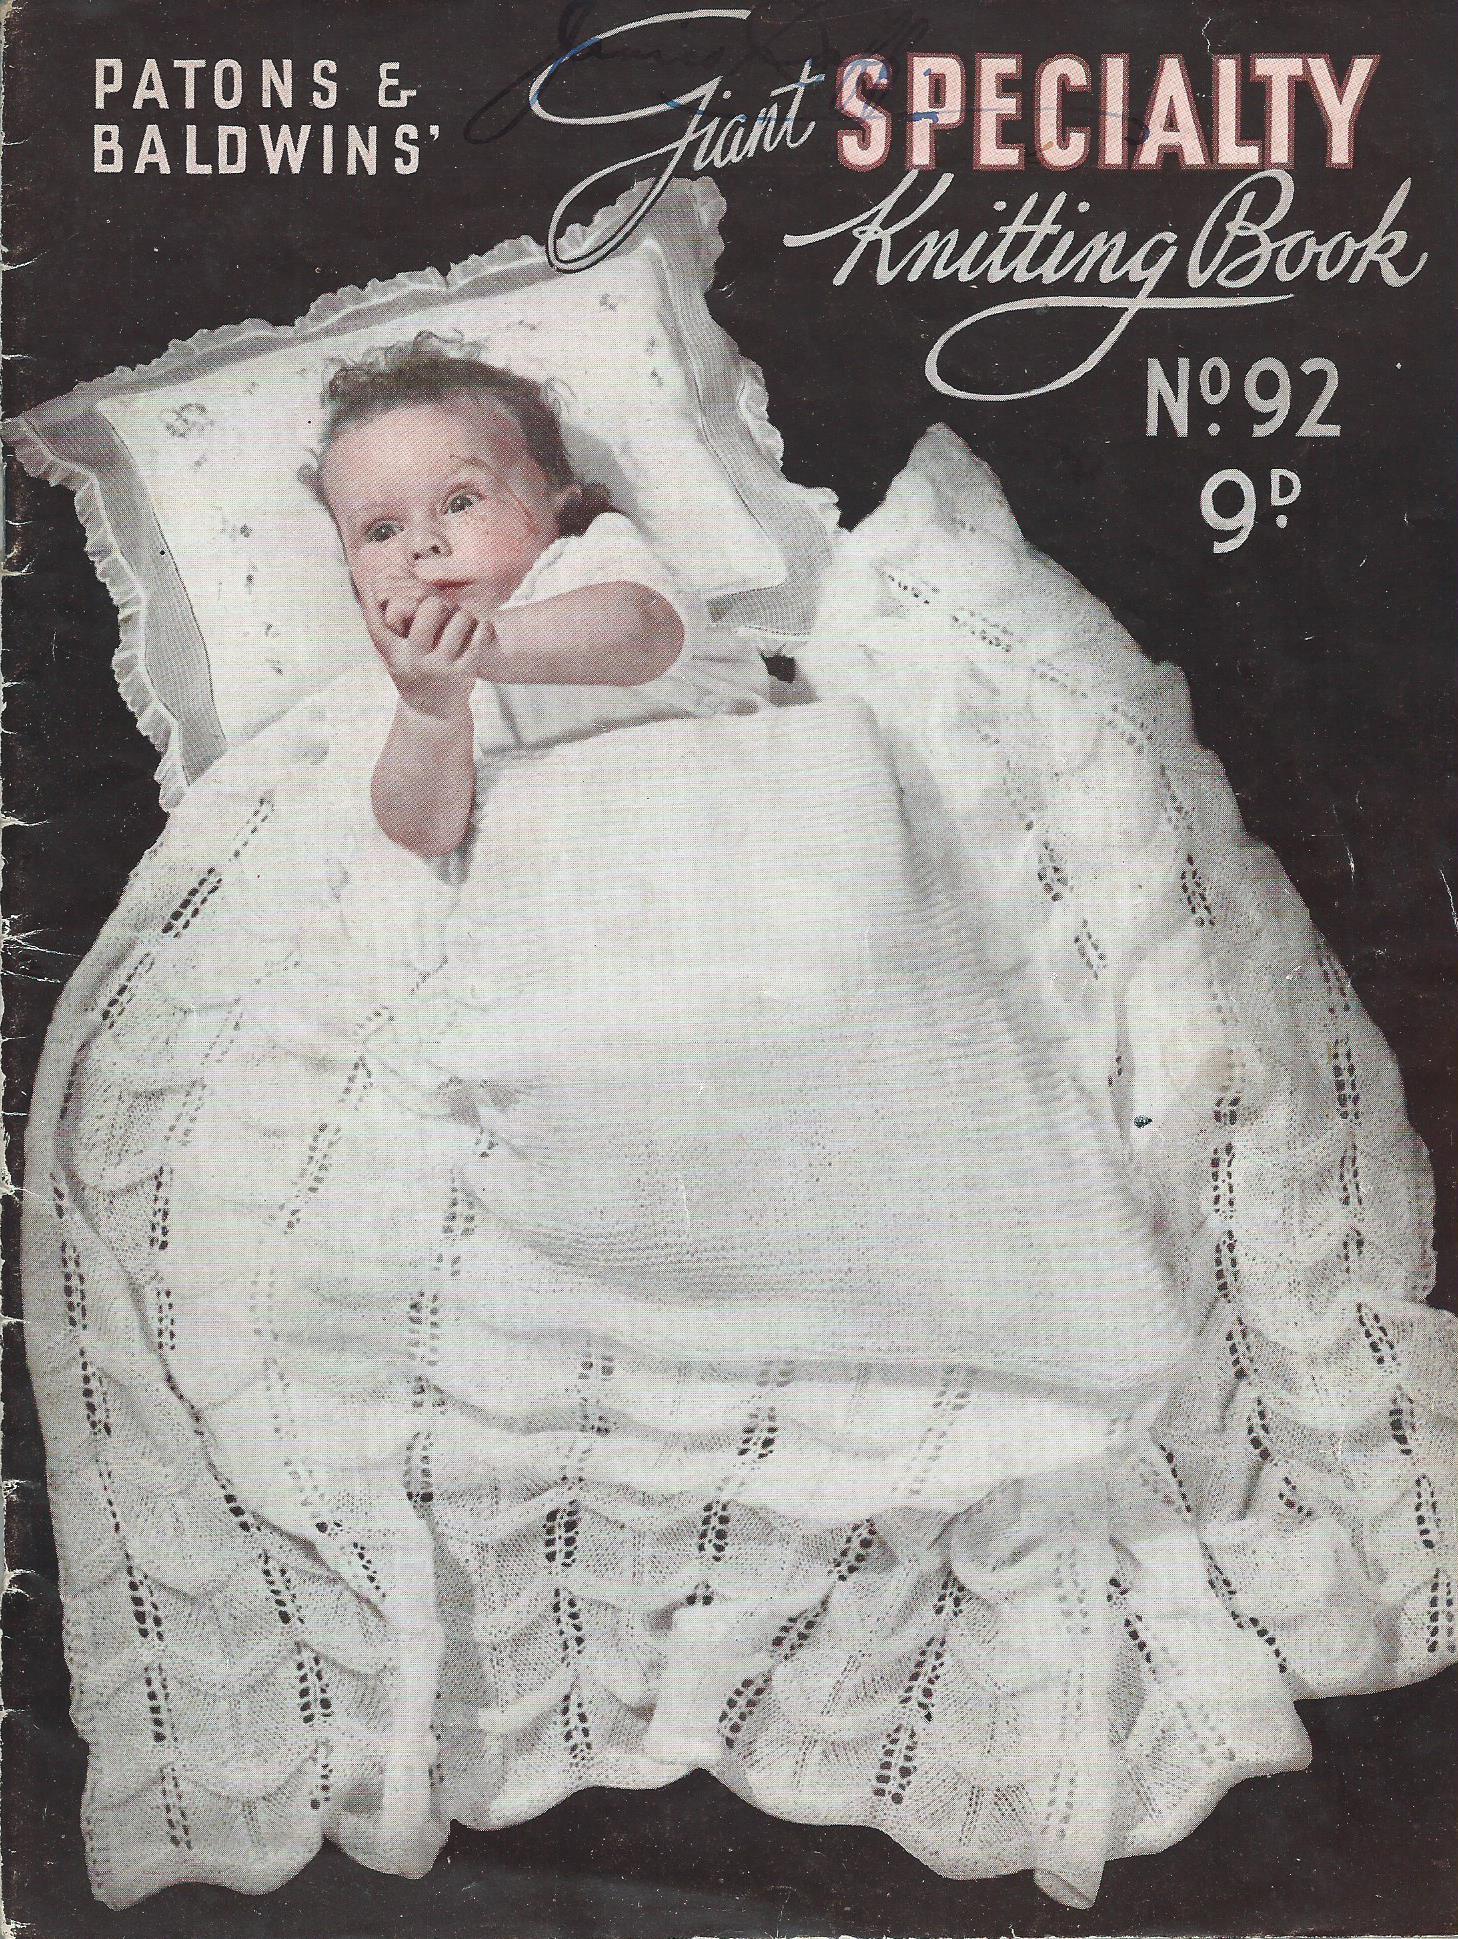 Patons Knitting Pattern Archive : Image - Patons 92.jpg Knitting and Crochet Pattern Archive Wiki FANDOM po...